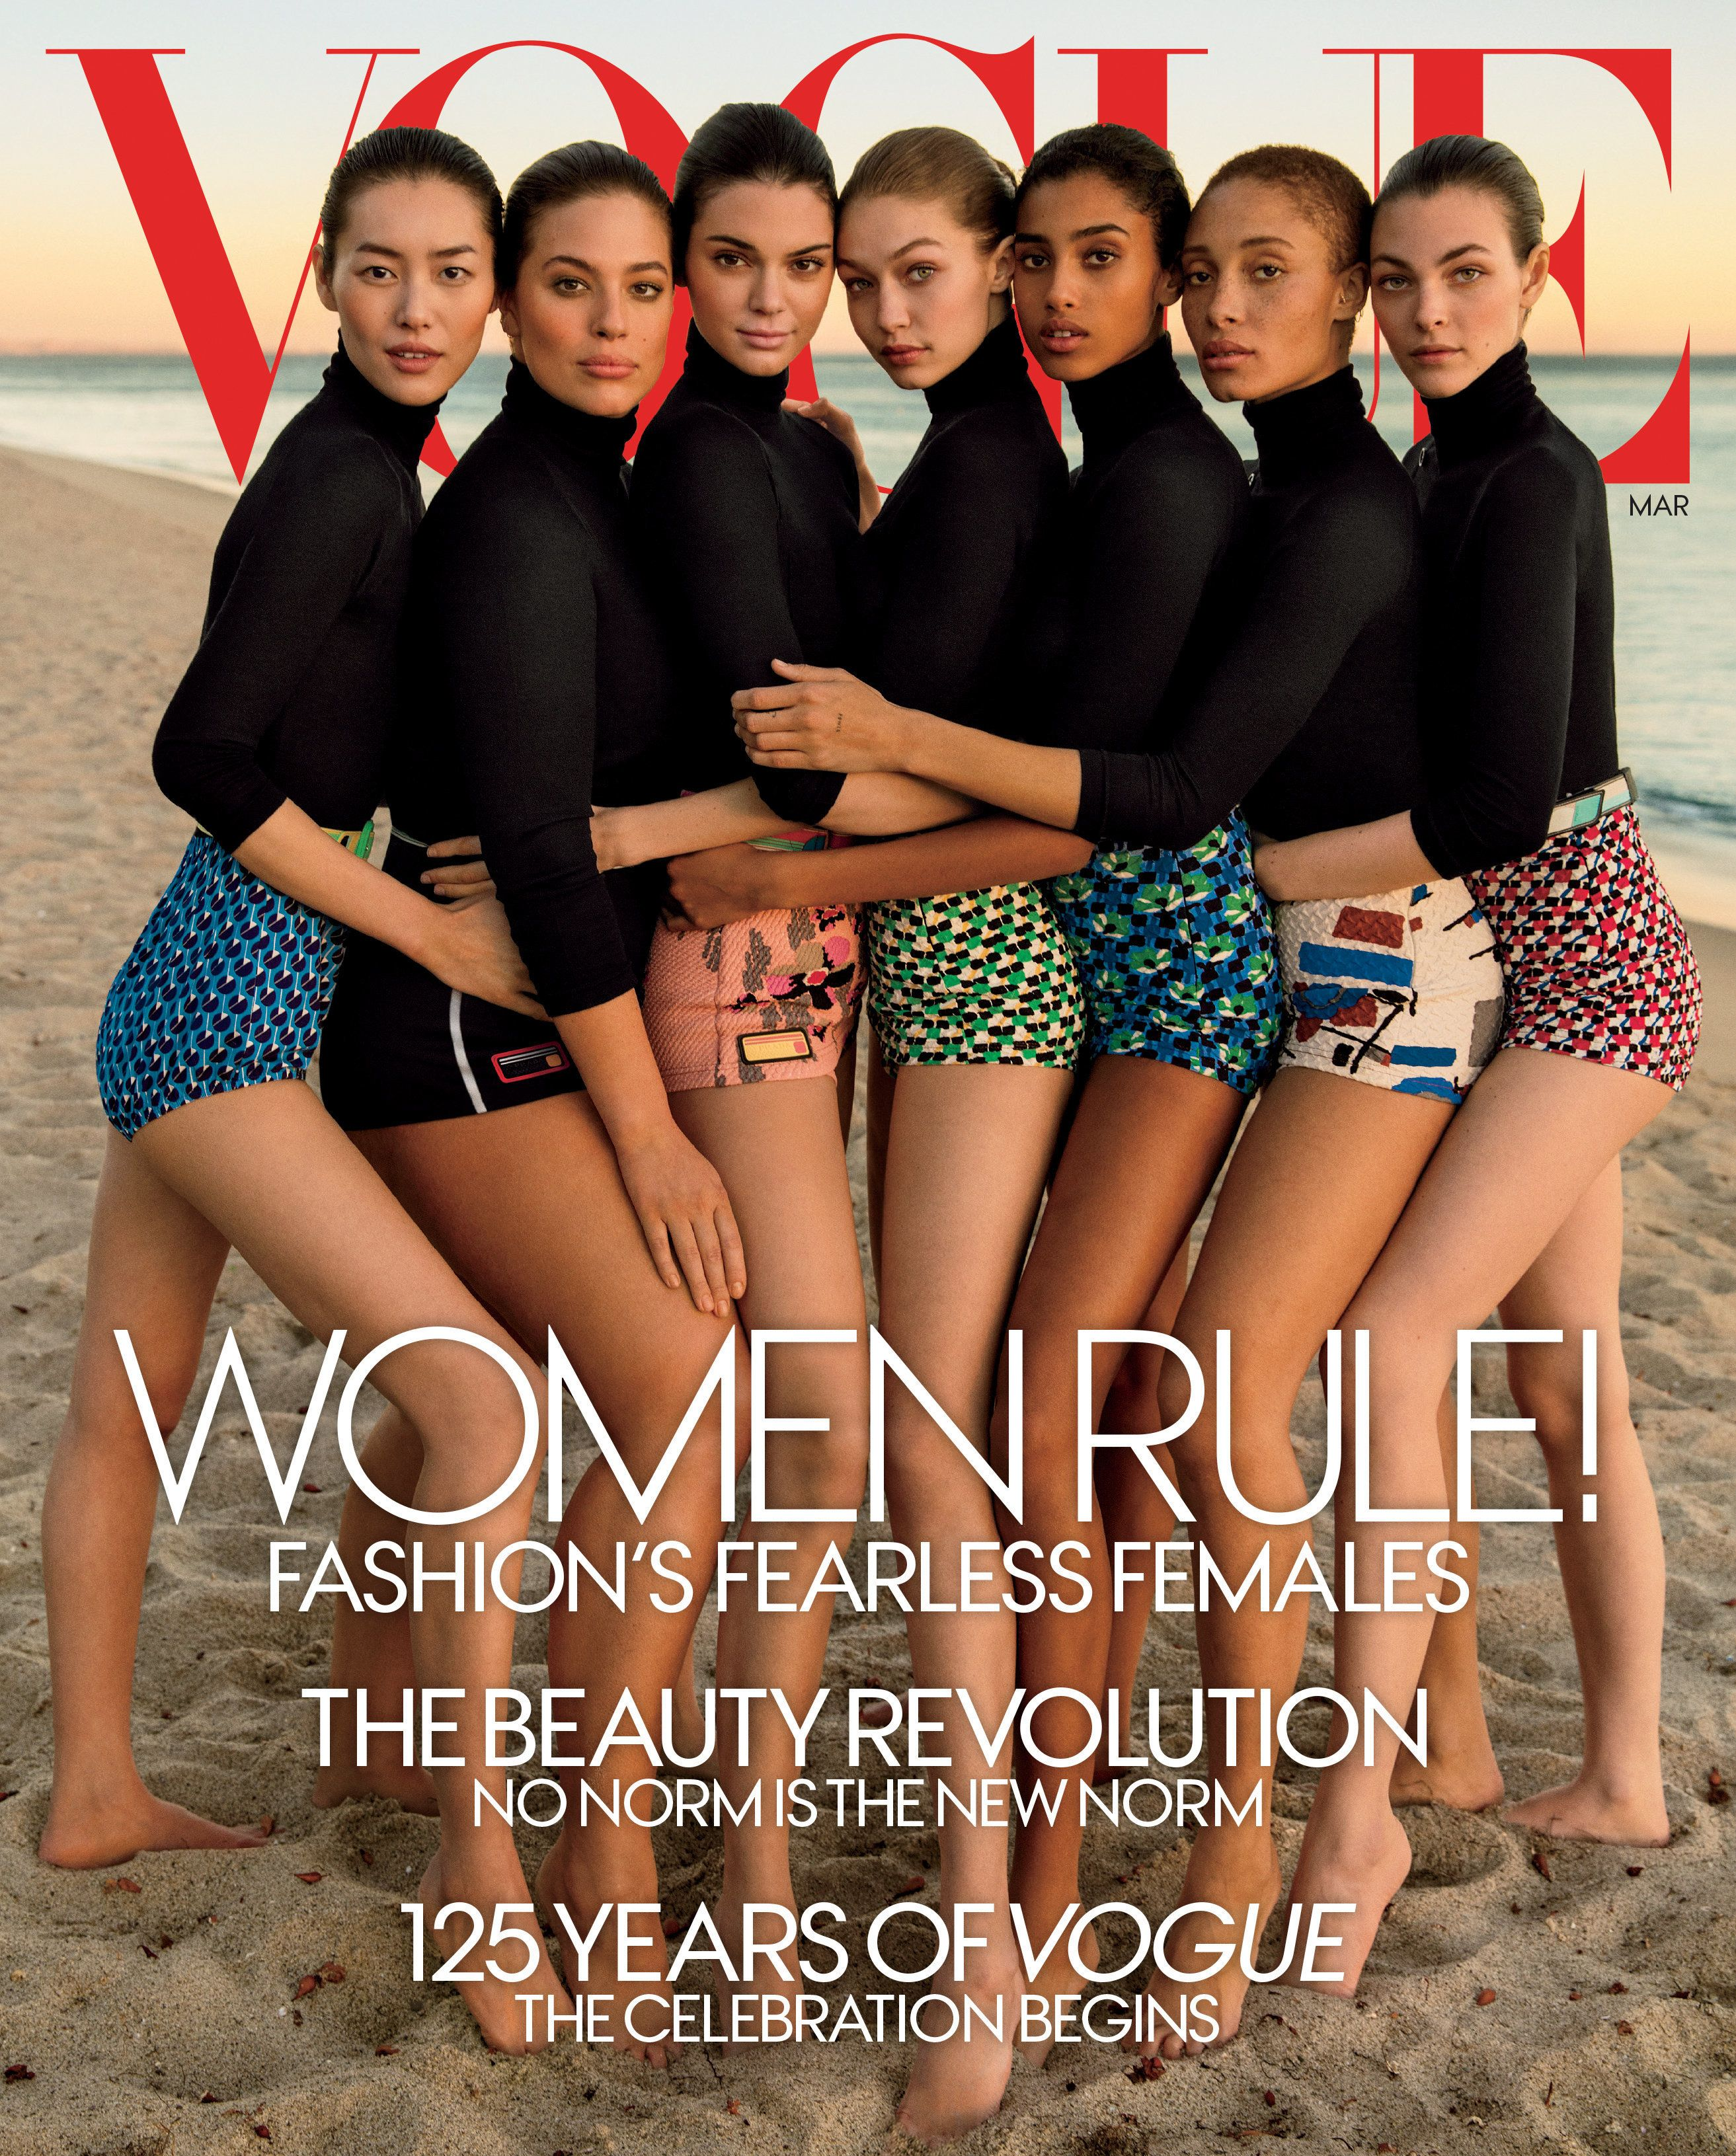 L to R: Liu Wen, Ashley Graham, Kendall Jenner, Gigi Hadid, Imaan Hammam,Adwoa Aboah, Vittoria Ceretti